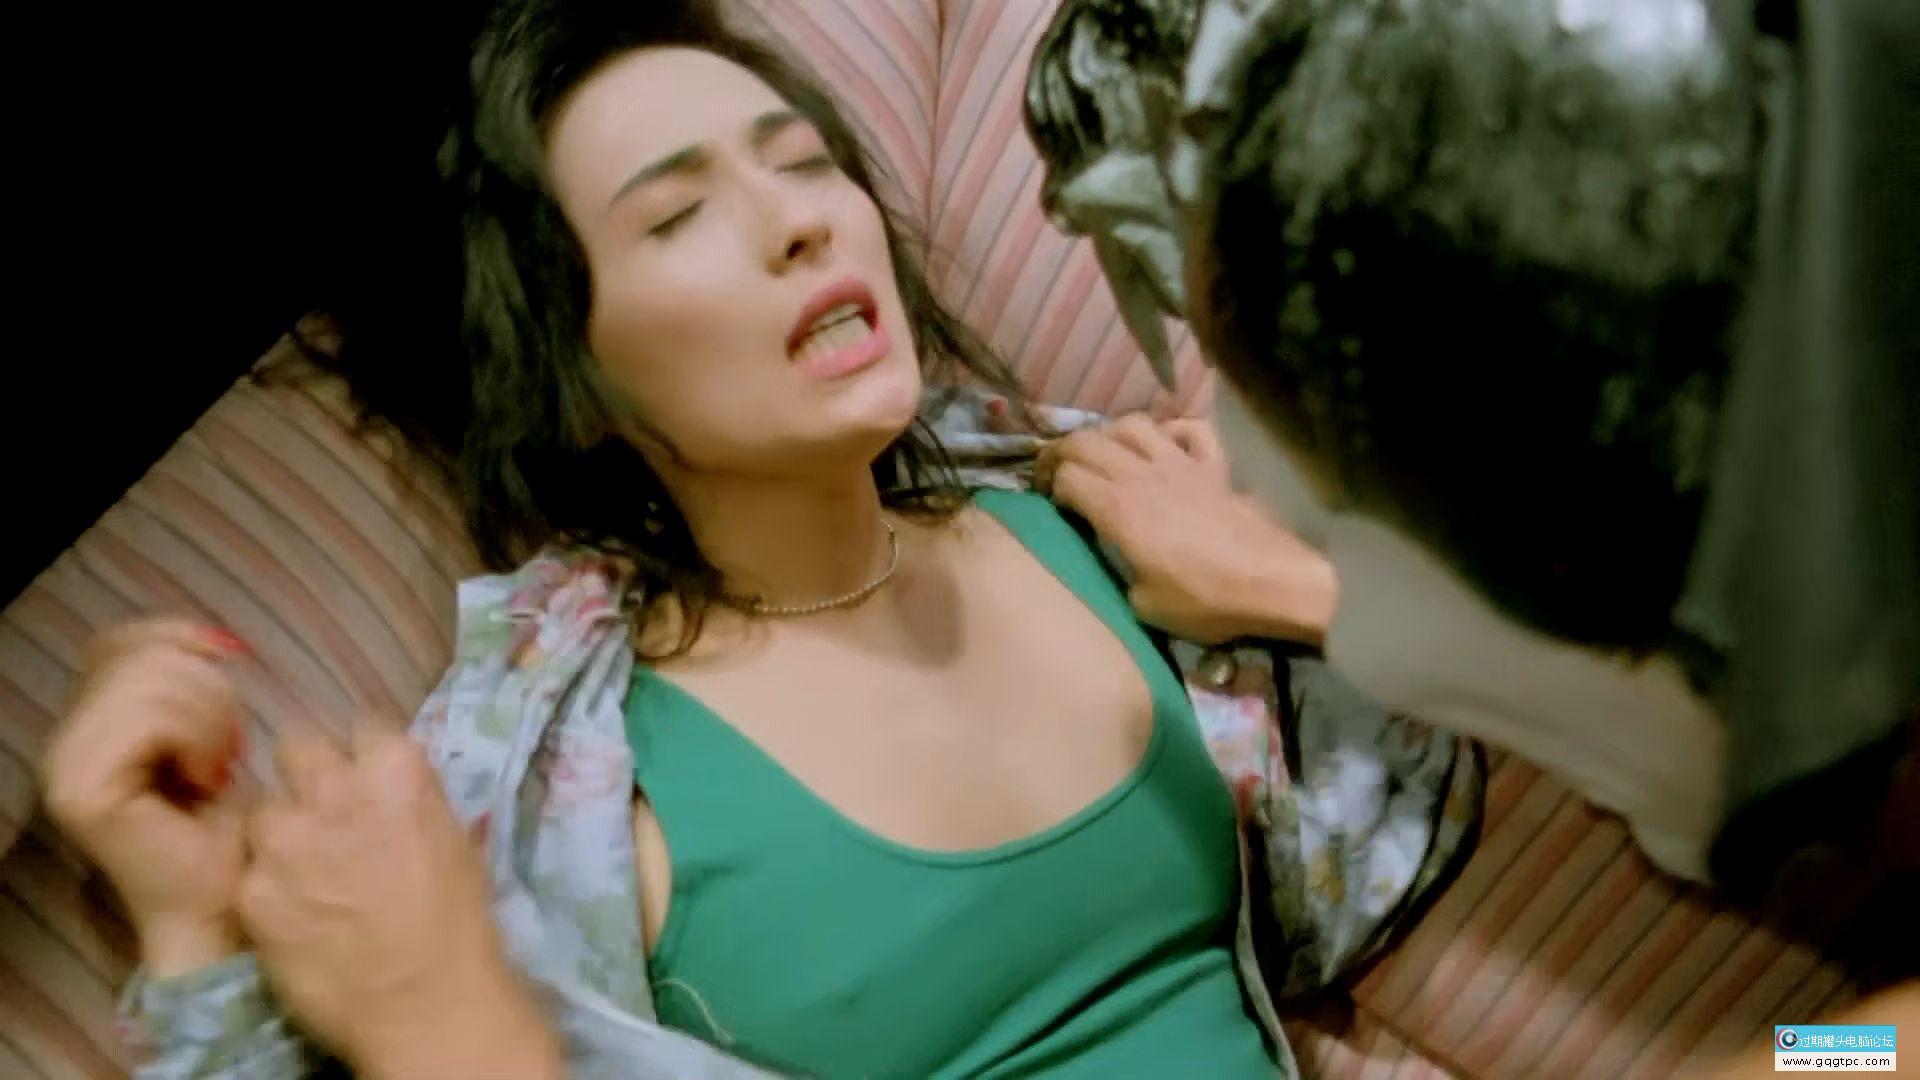 Z..My.Pale.Lover.1993.WEB-DL.1080P.x265.10bit.AAC.Cantonese.CHT-FFansWEB.mp4_20171225_123432.1620c573.jpg